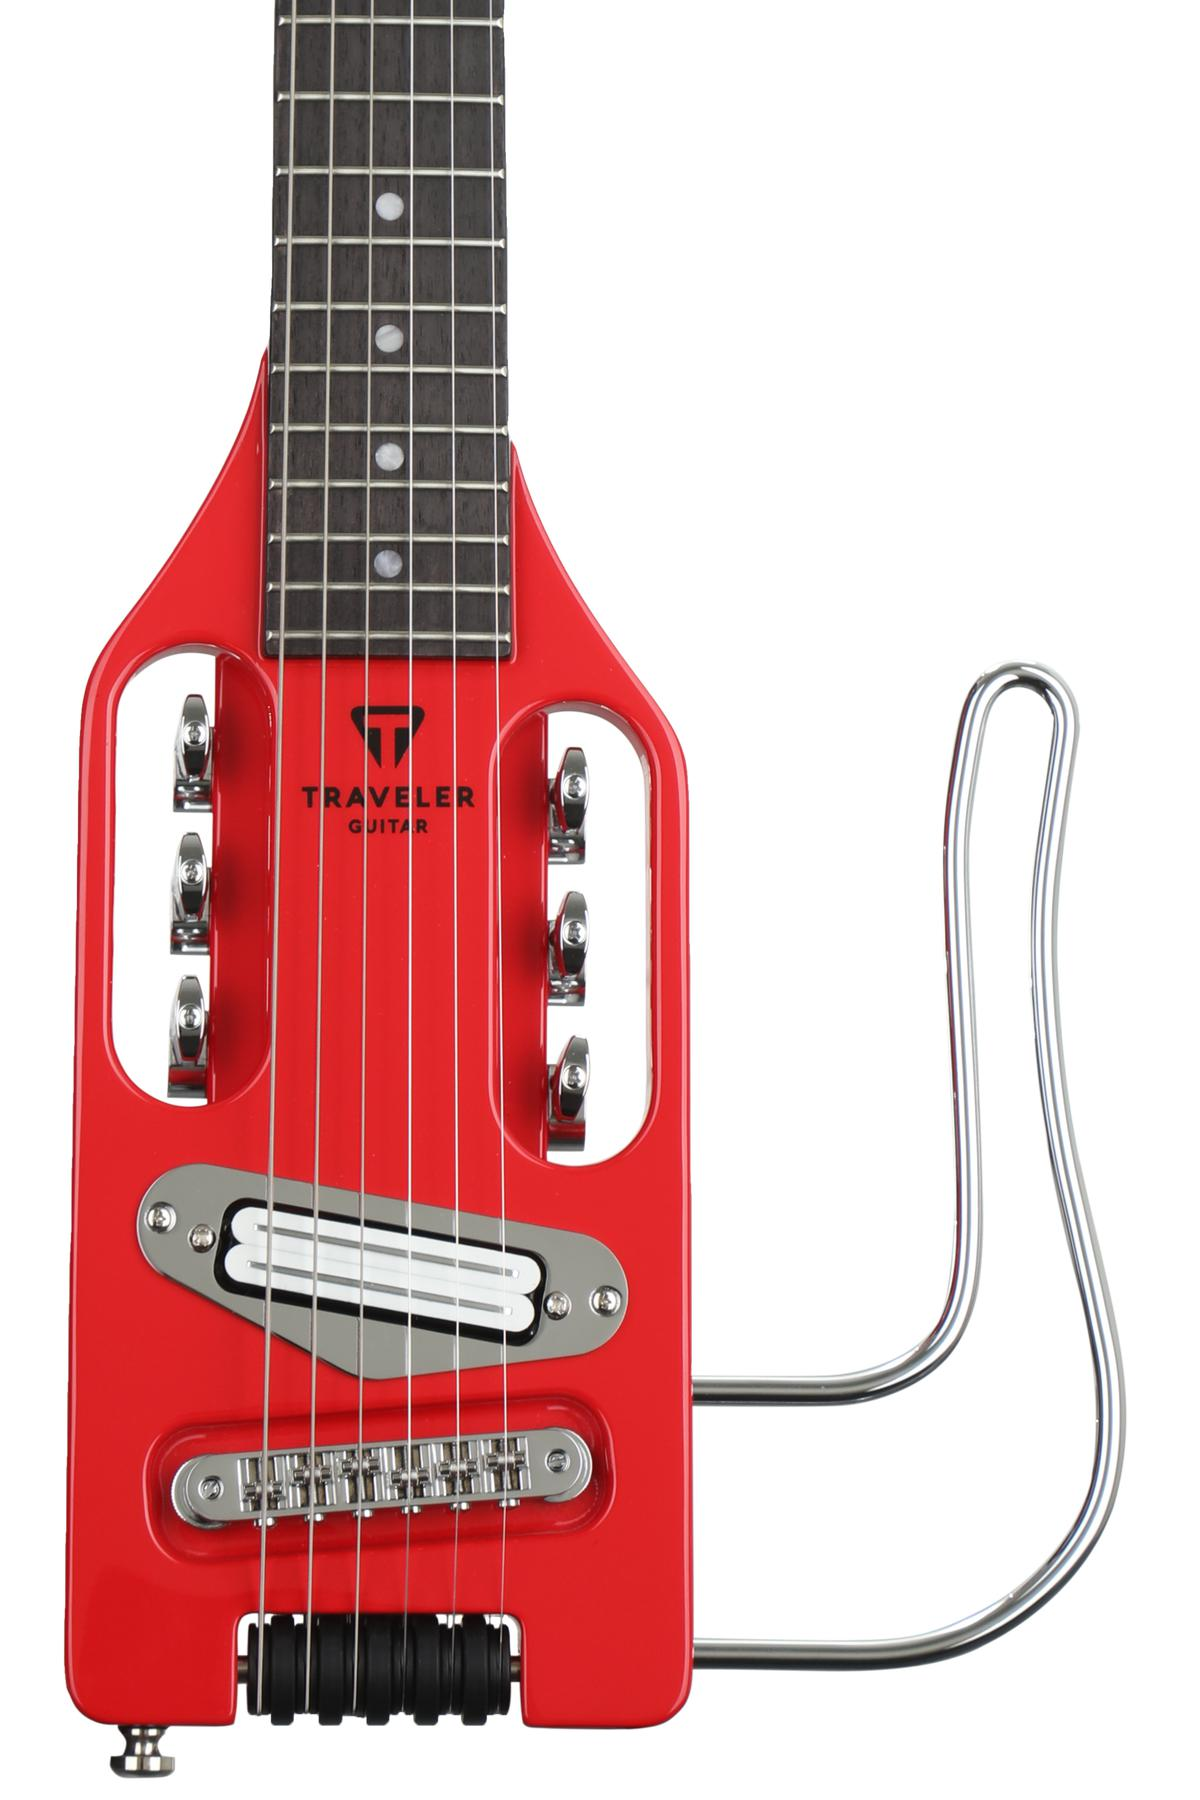 5. Traveler Guitar Ultra-Light Solid-Body Electric Guitar